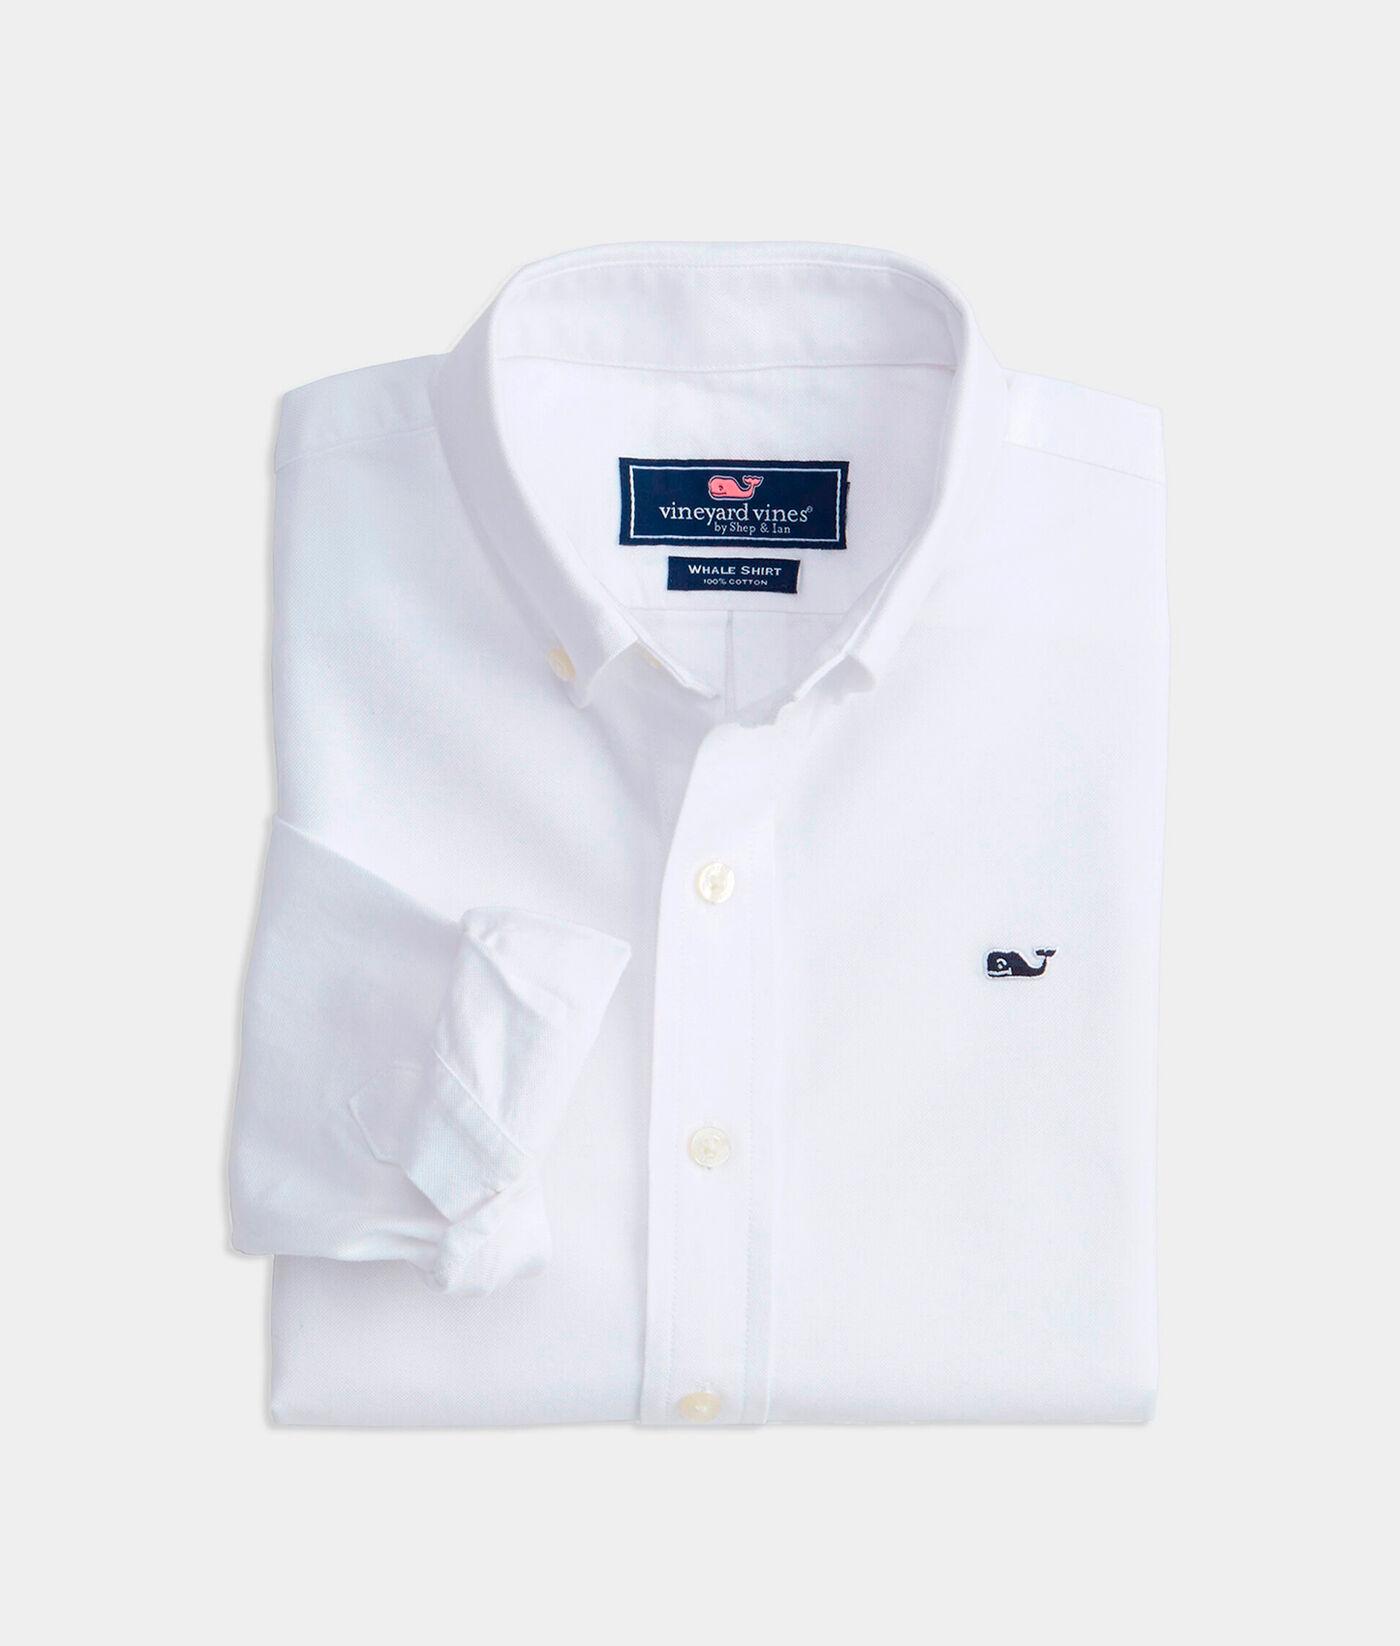 Vineyard Vines Mens Long Sleeve Button Down Whale Shirt Oxford